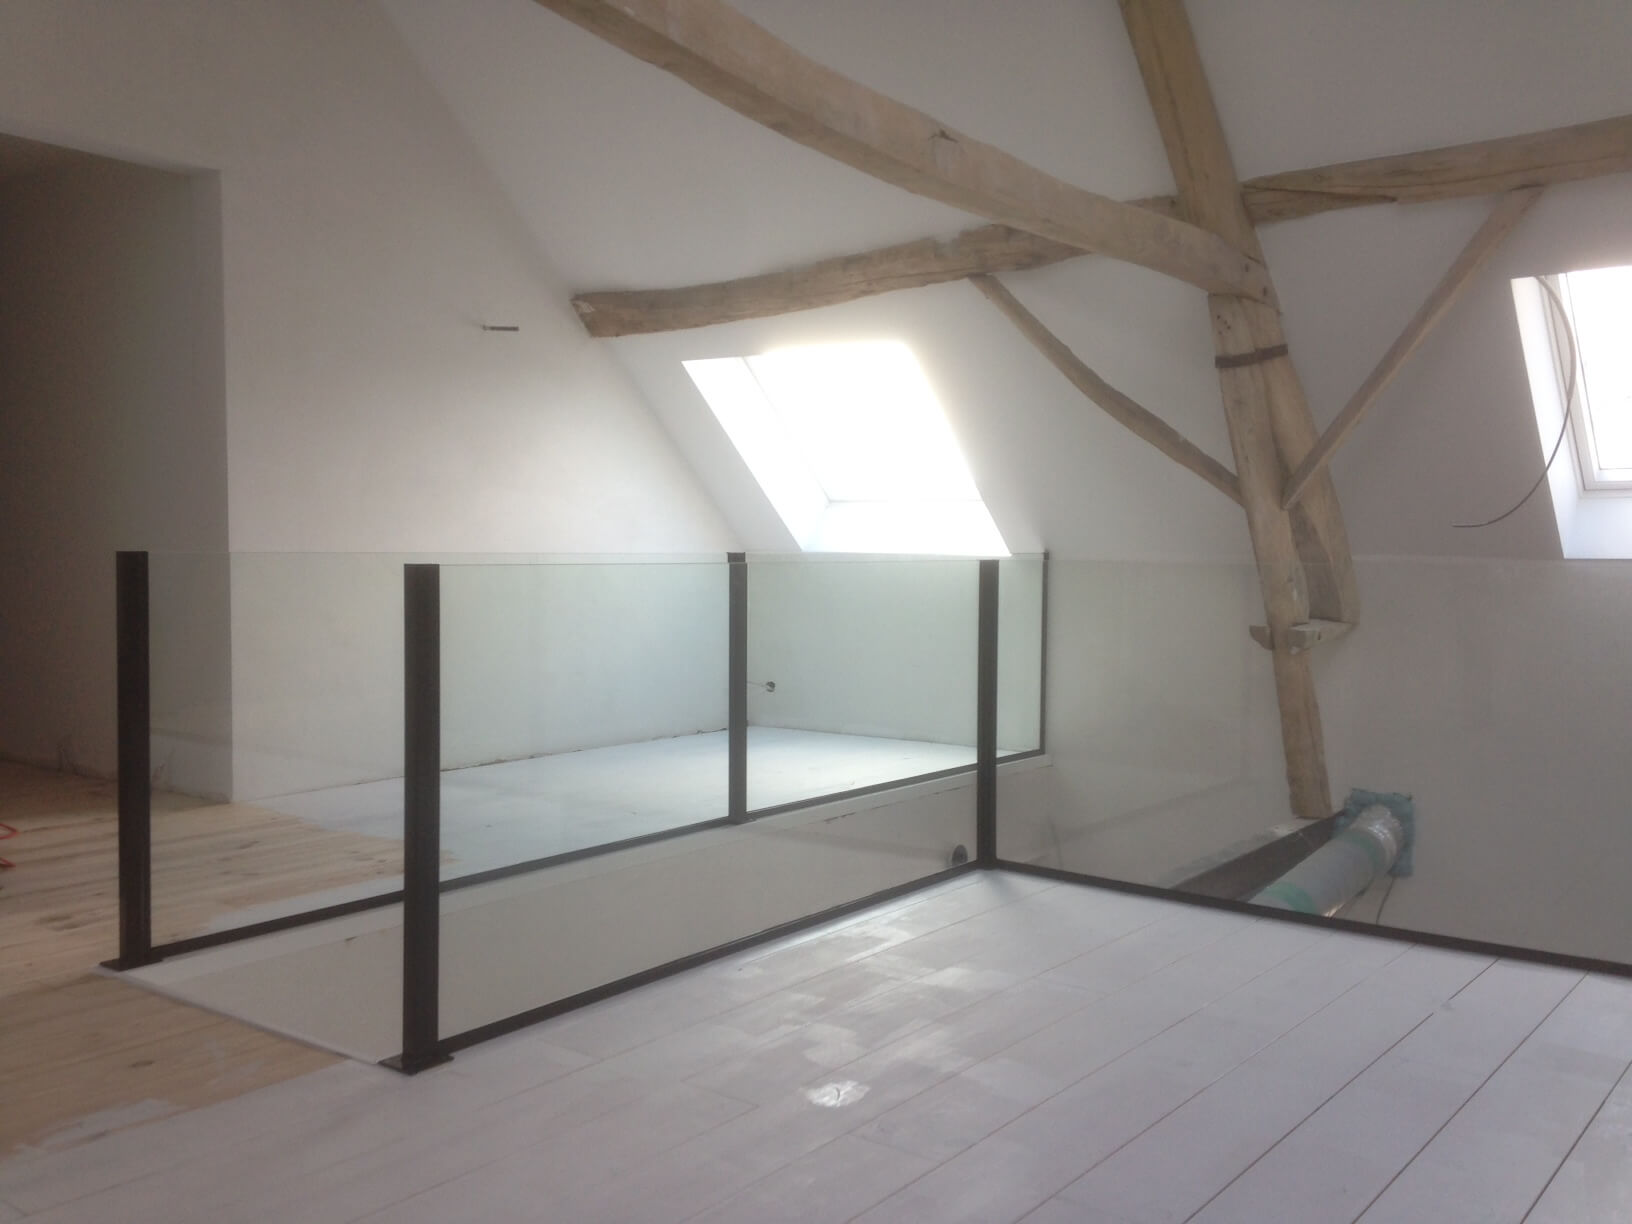 Pglas - Glazen balustrade gelaagd glas opbouw zwarte paaltjes 013